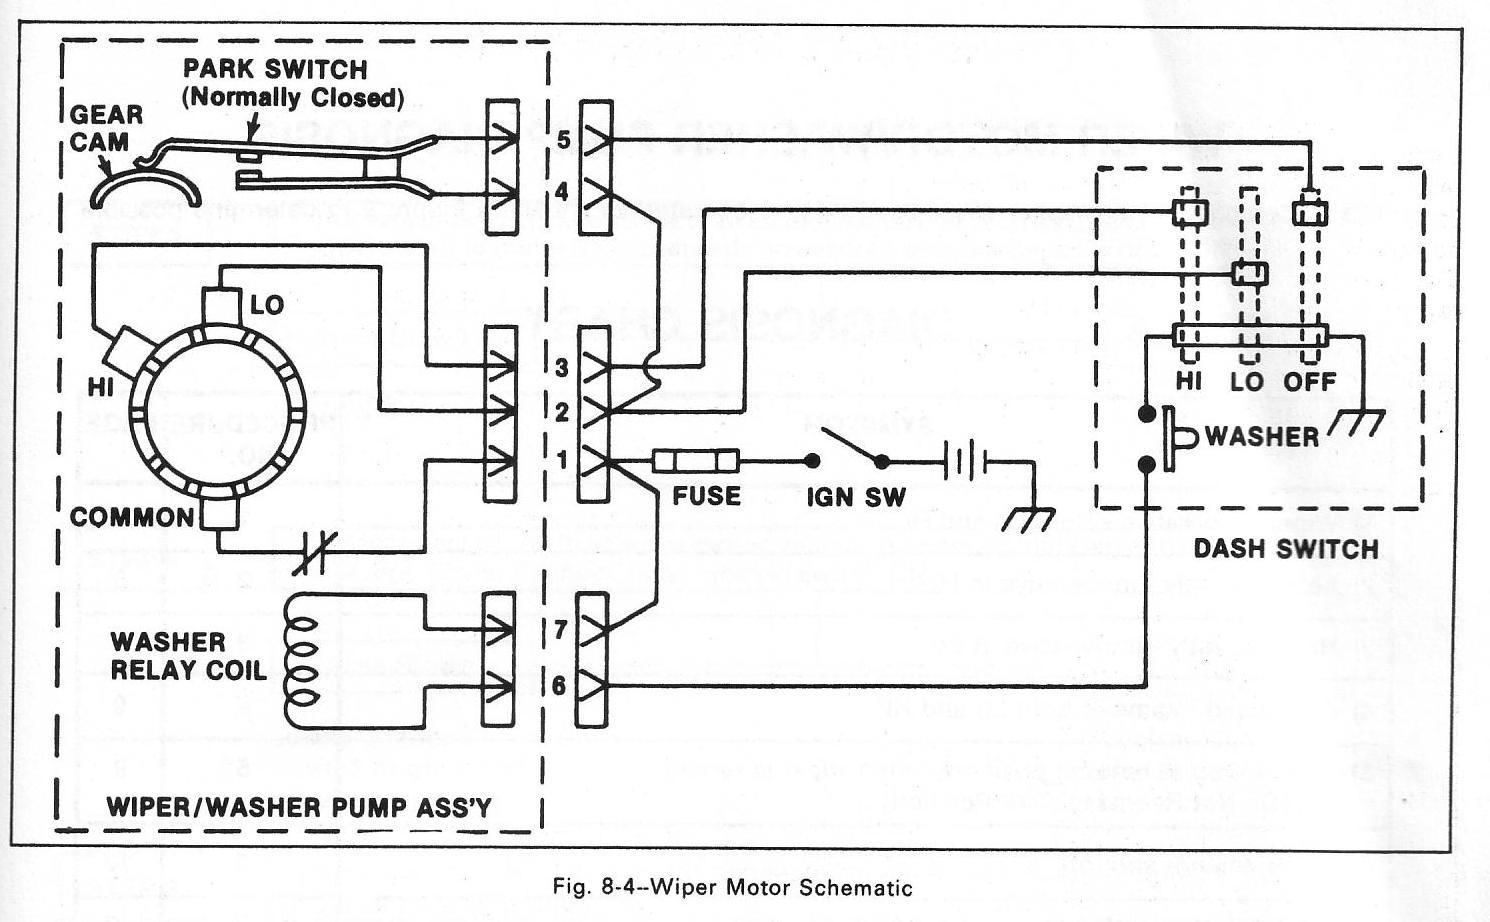 1968 chevy wiper motor wiring diagram cg 2604  wiper motor wiring diagram for 1968 vw beetle wiring  wiper motor wiring diagram for 1968 vw